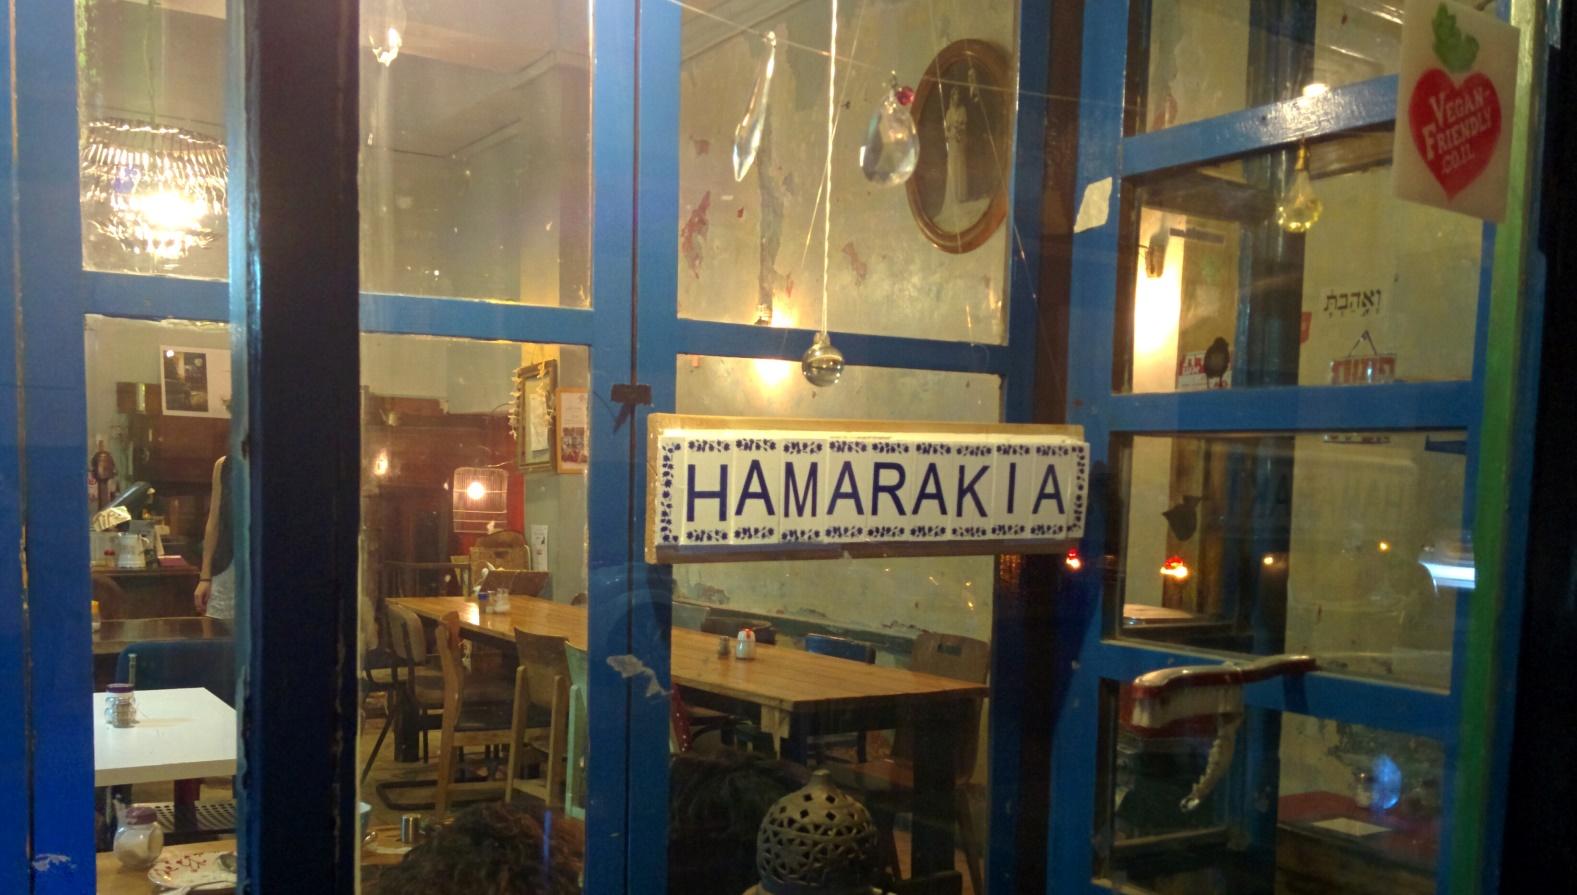 Hamarakia (The Soupery) in Jerusalem. Photo: courtesy